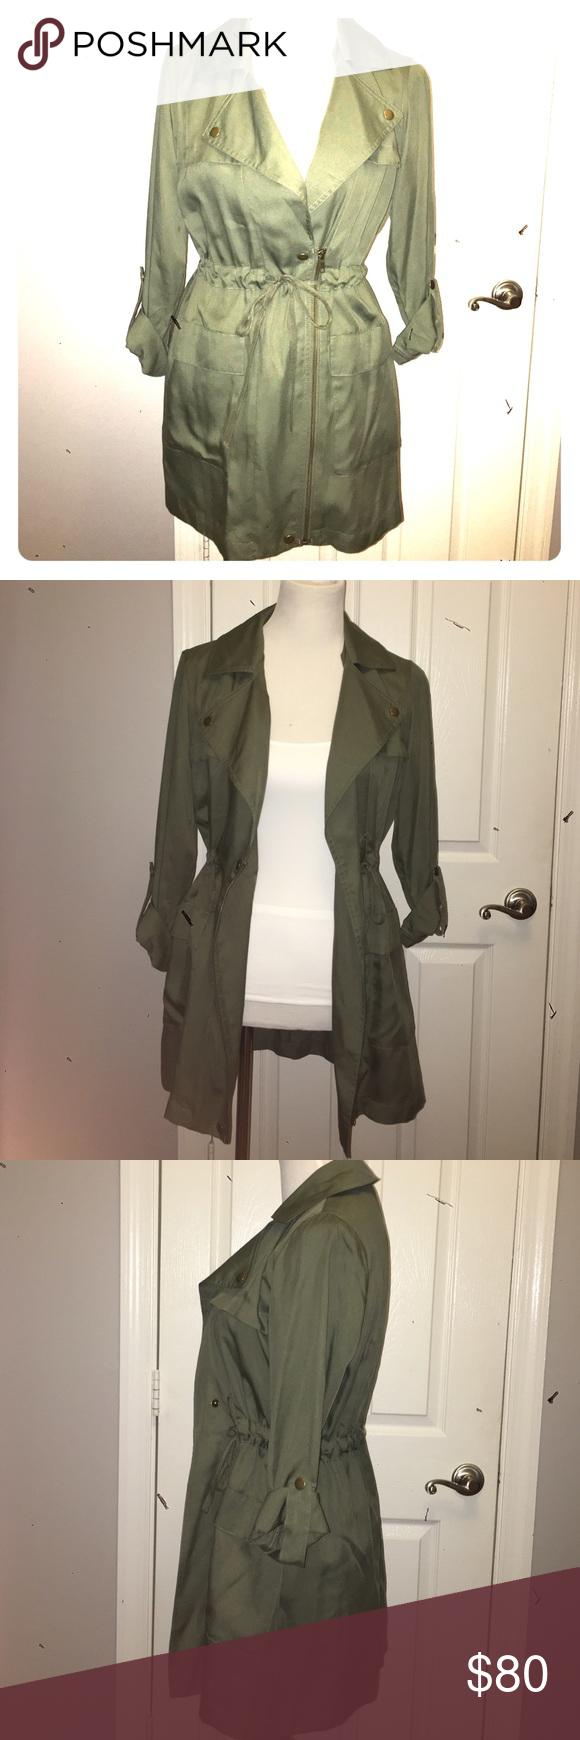 Loft Olive Green Drawstring jacket | Green jacket, Utility jacket ...